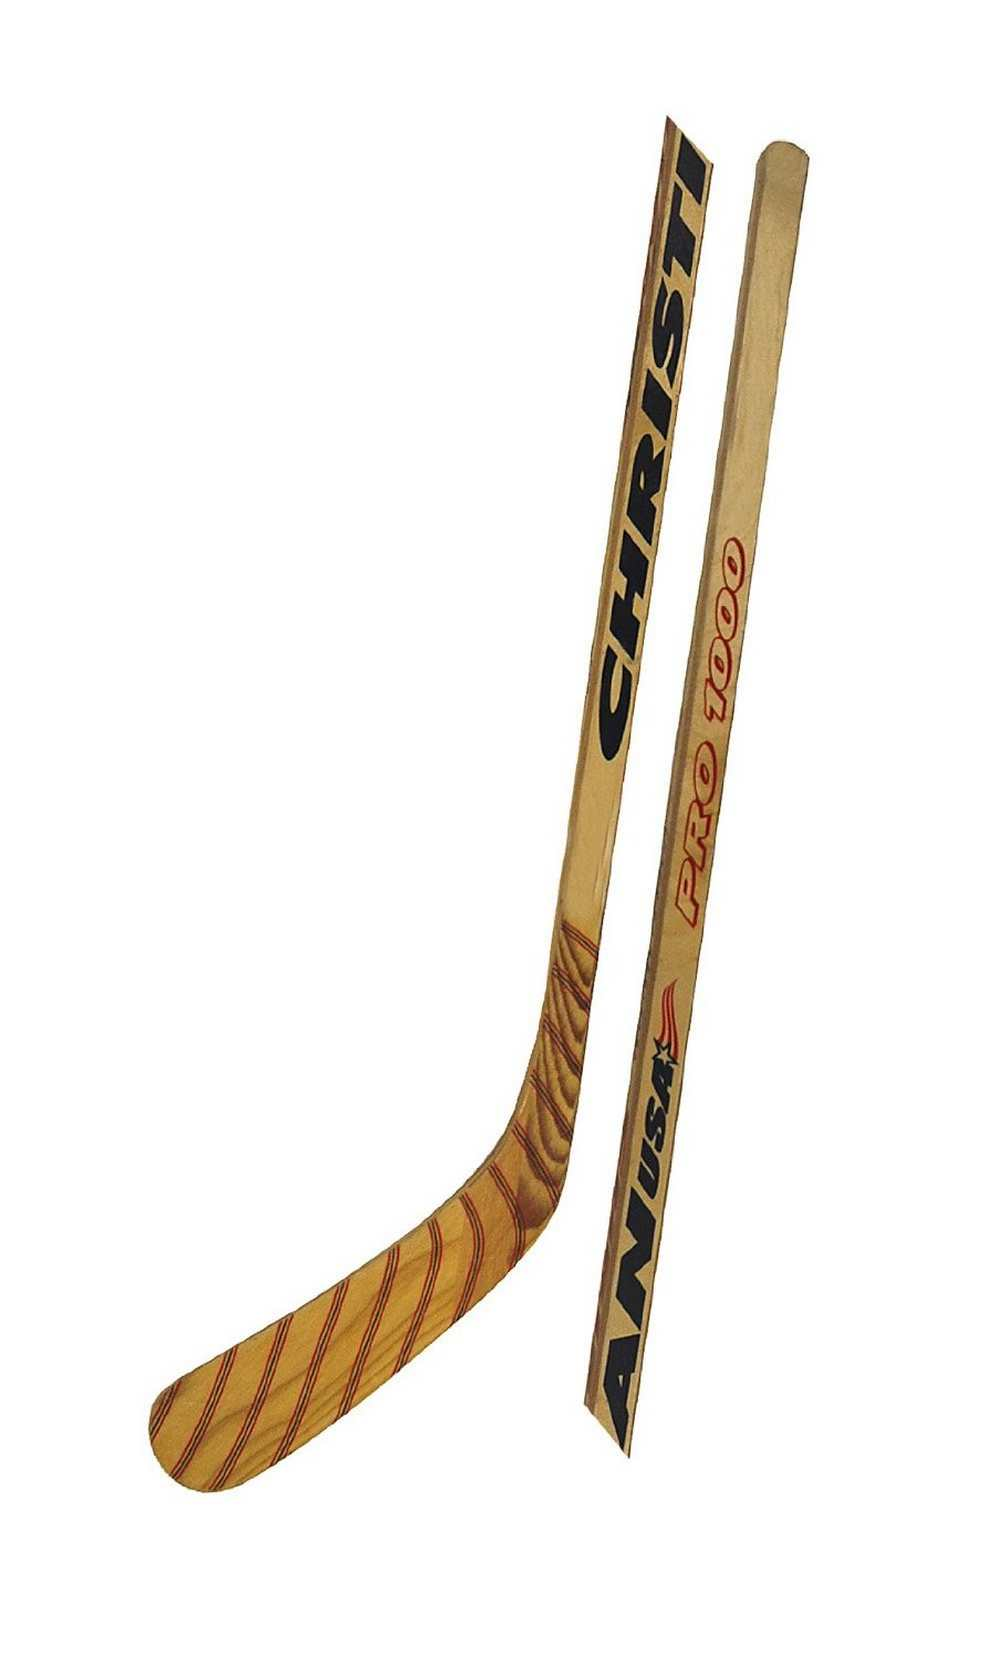 Christian Pro 1000 Wood Ice Hockey Stick: Three Sizes ...